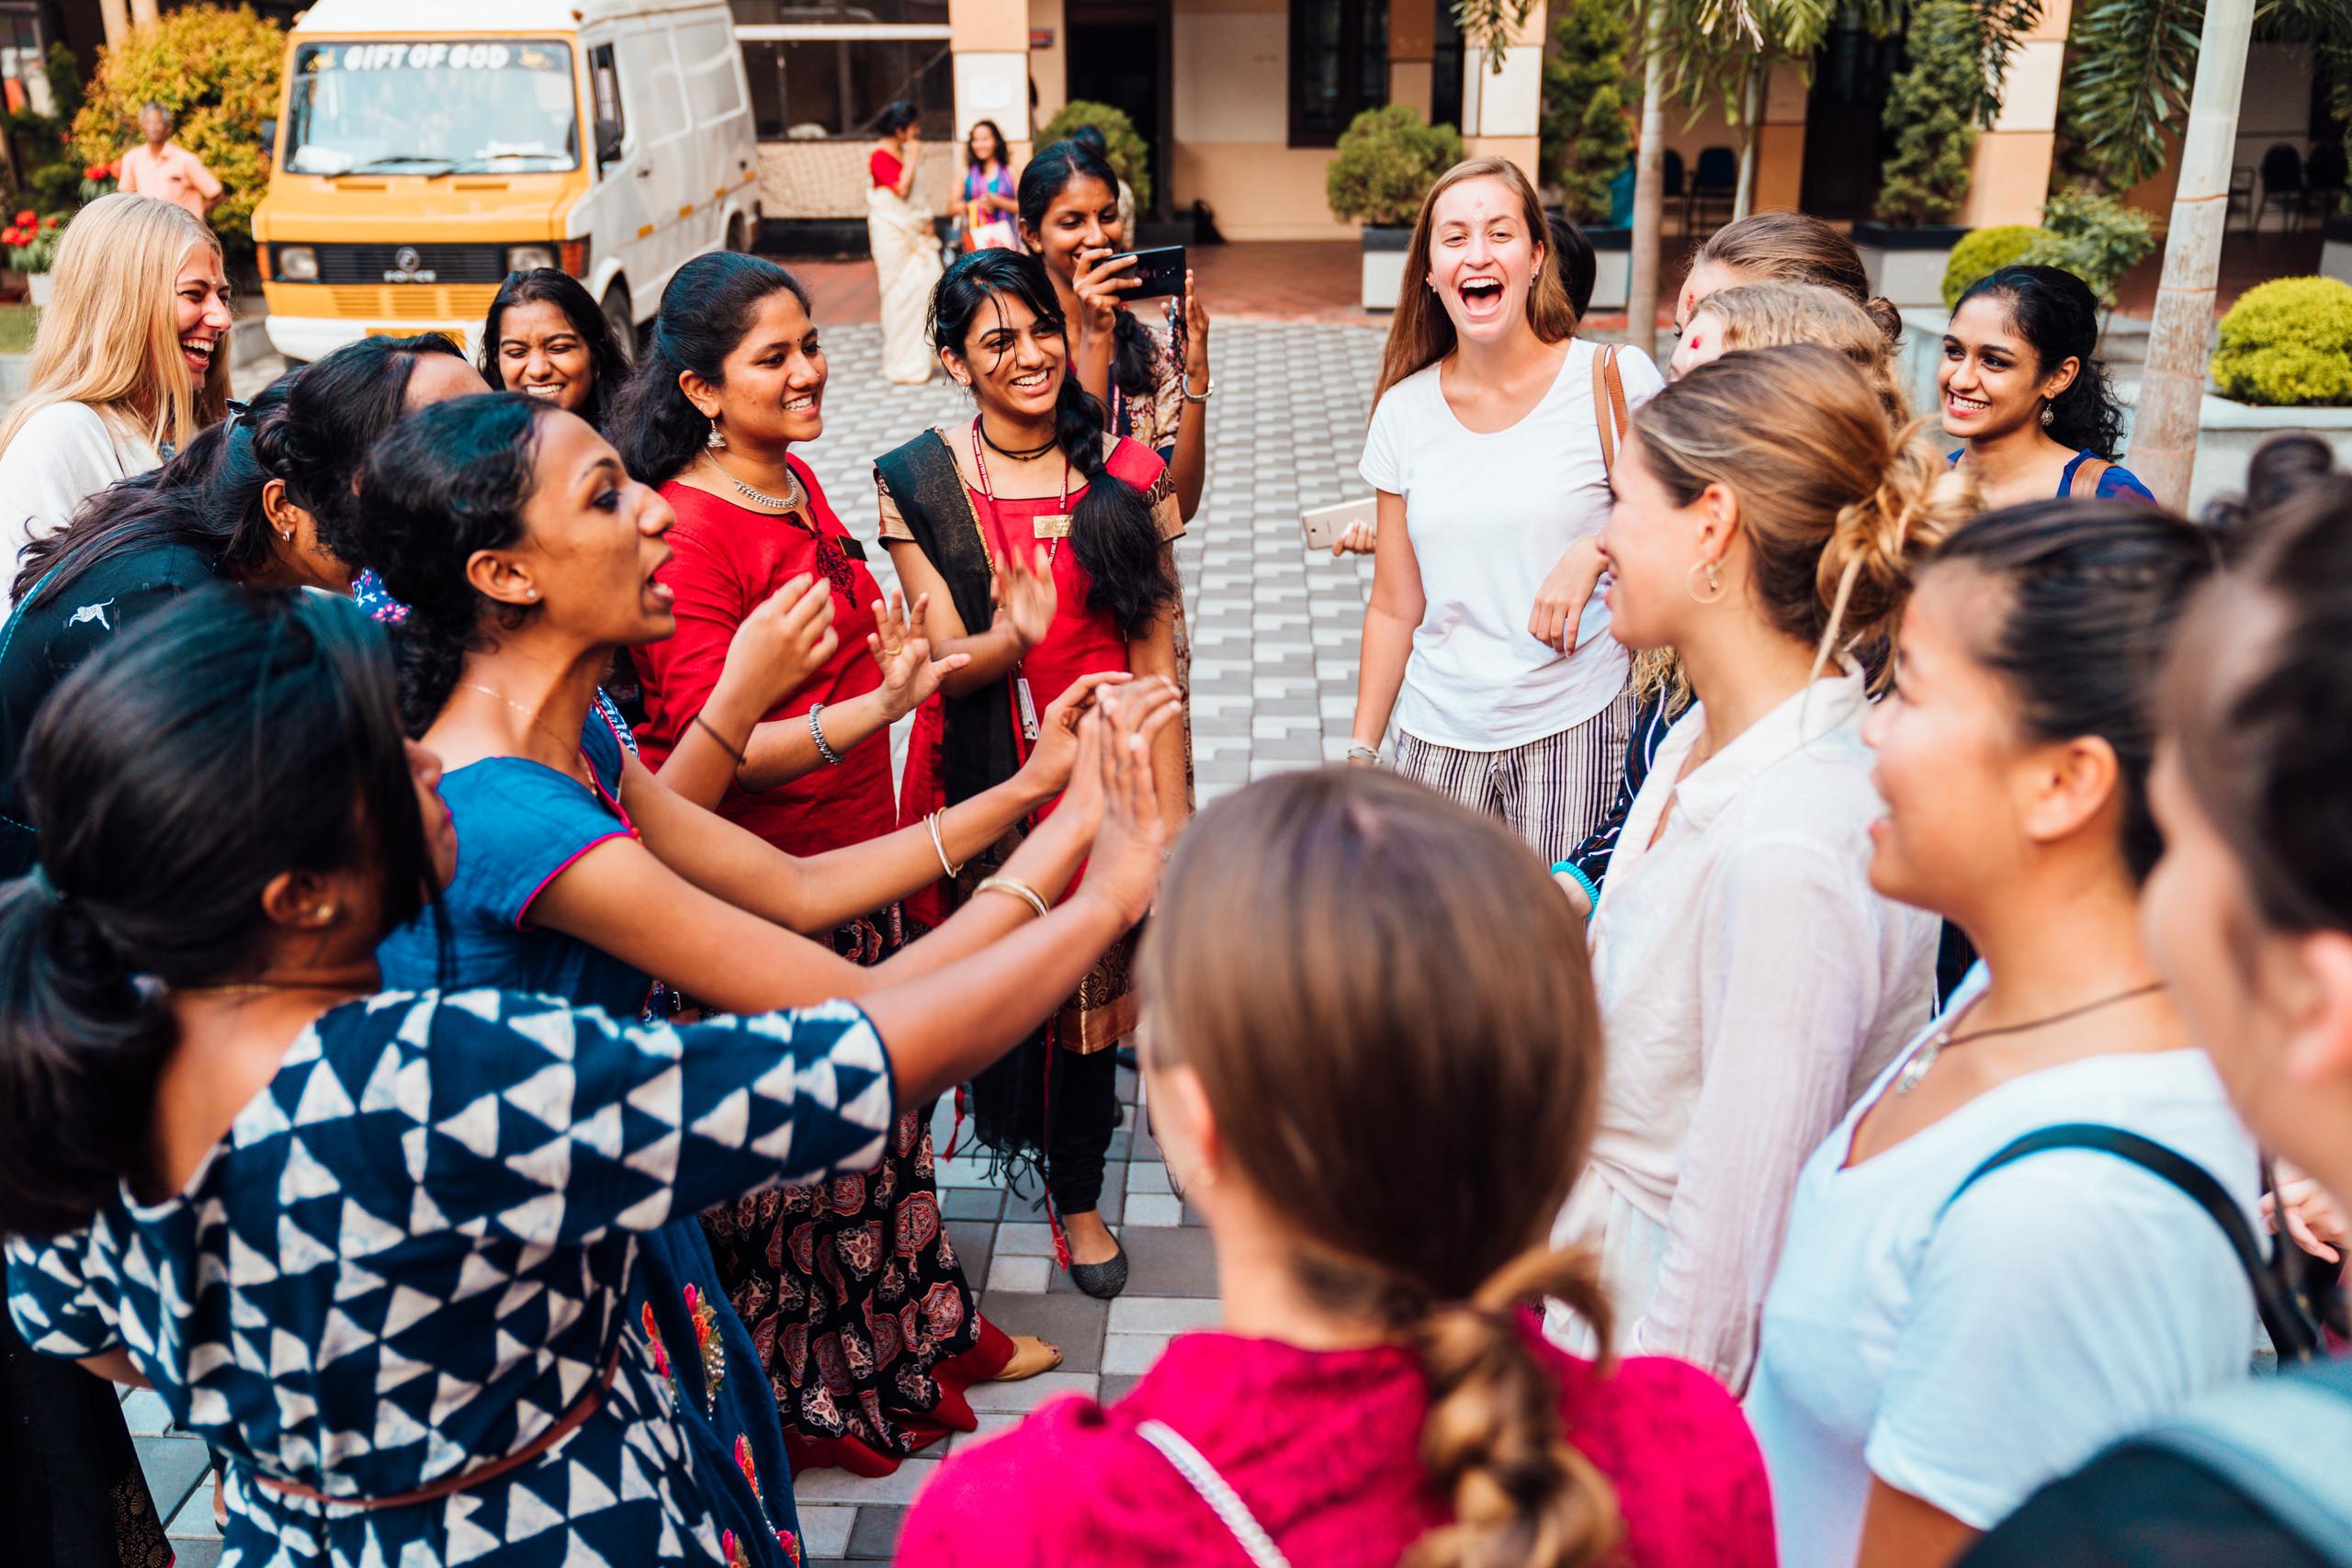 India: Shot by Mariah Harkey